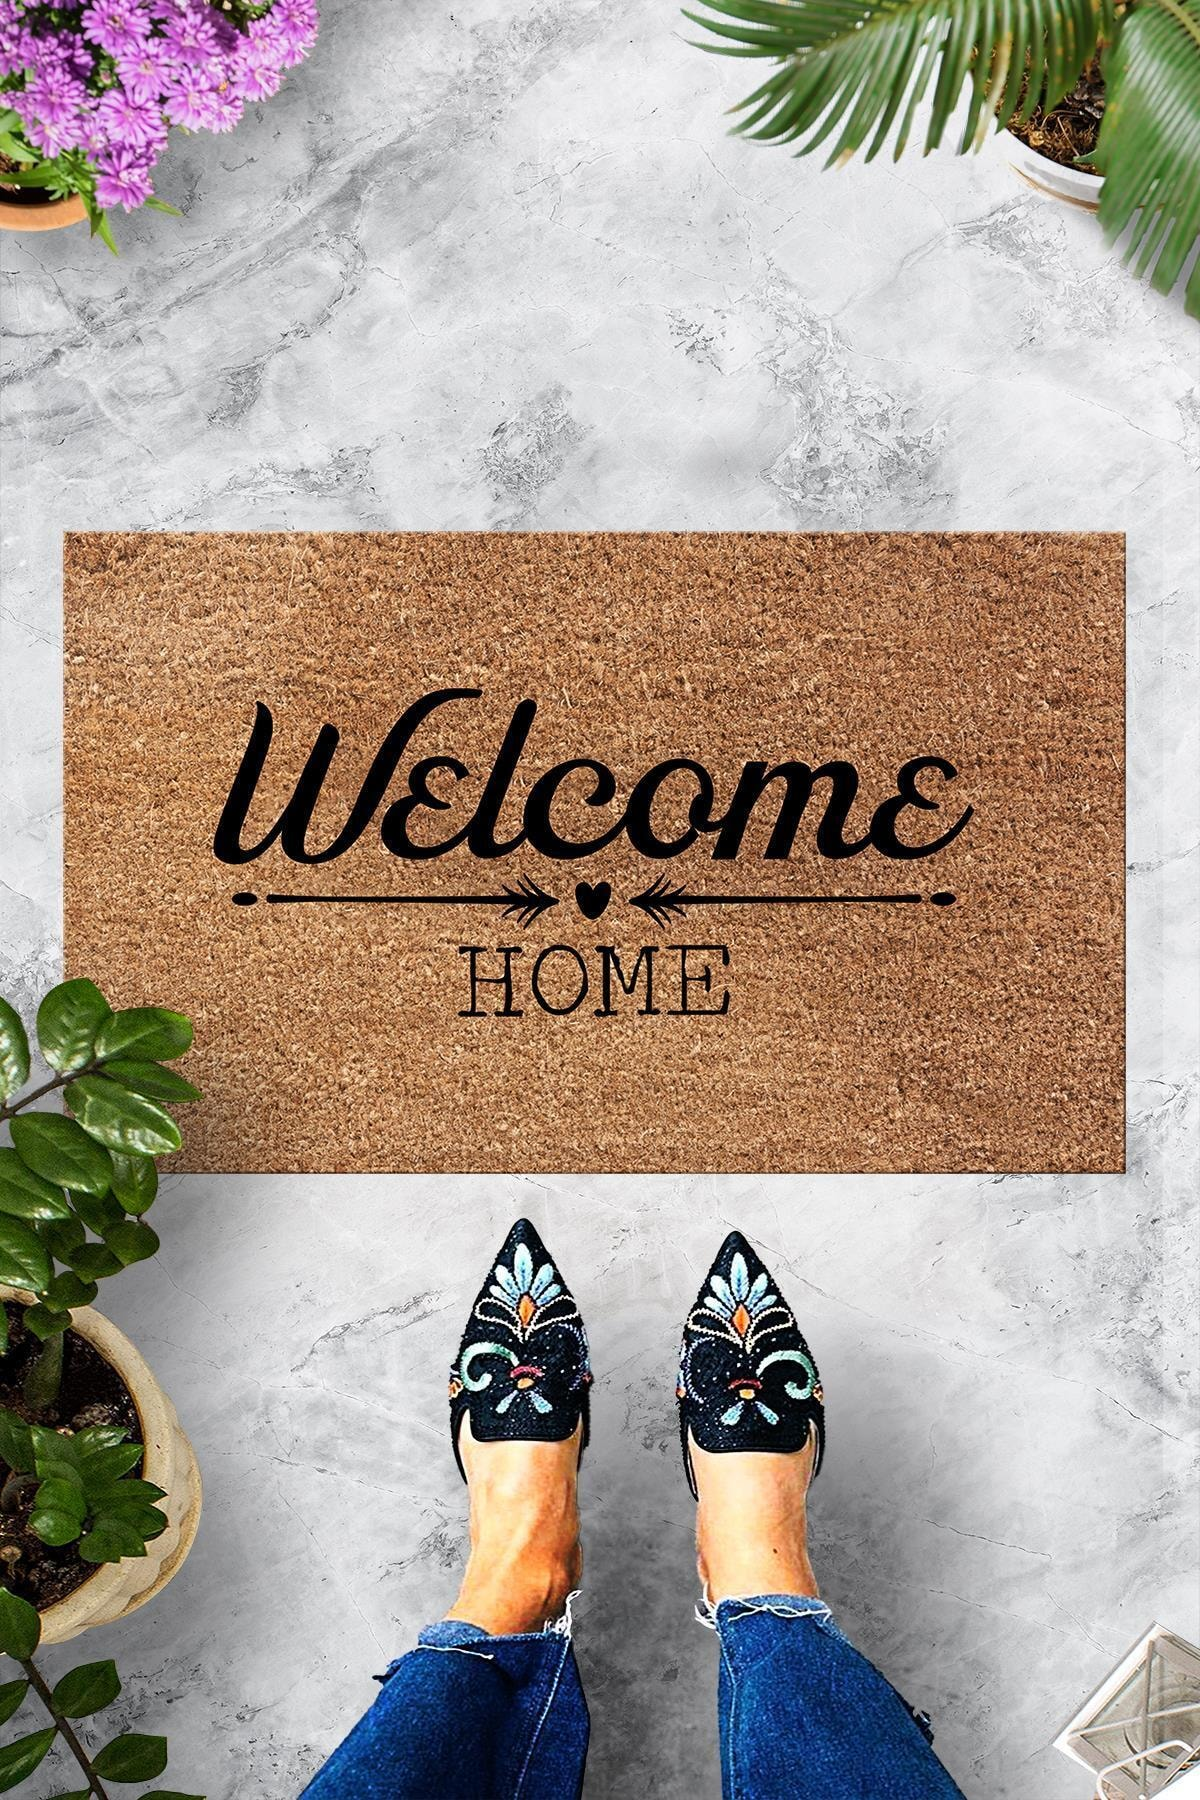 Pienso Home Welcome Home Bej Dekoratif Kapı Önü Paspası